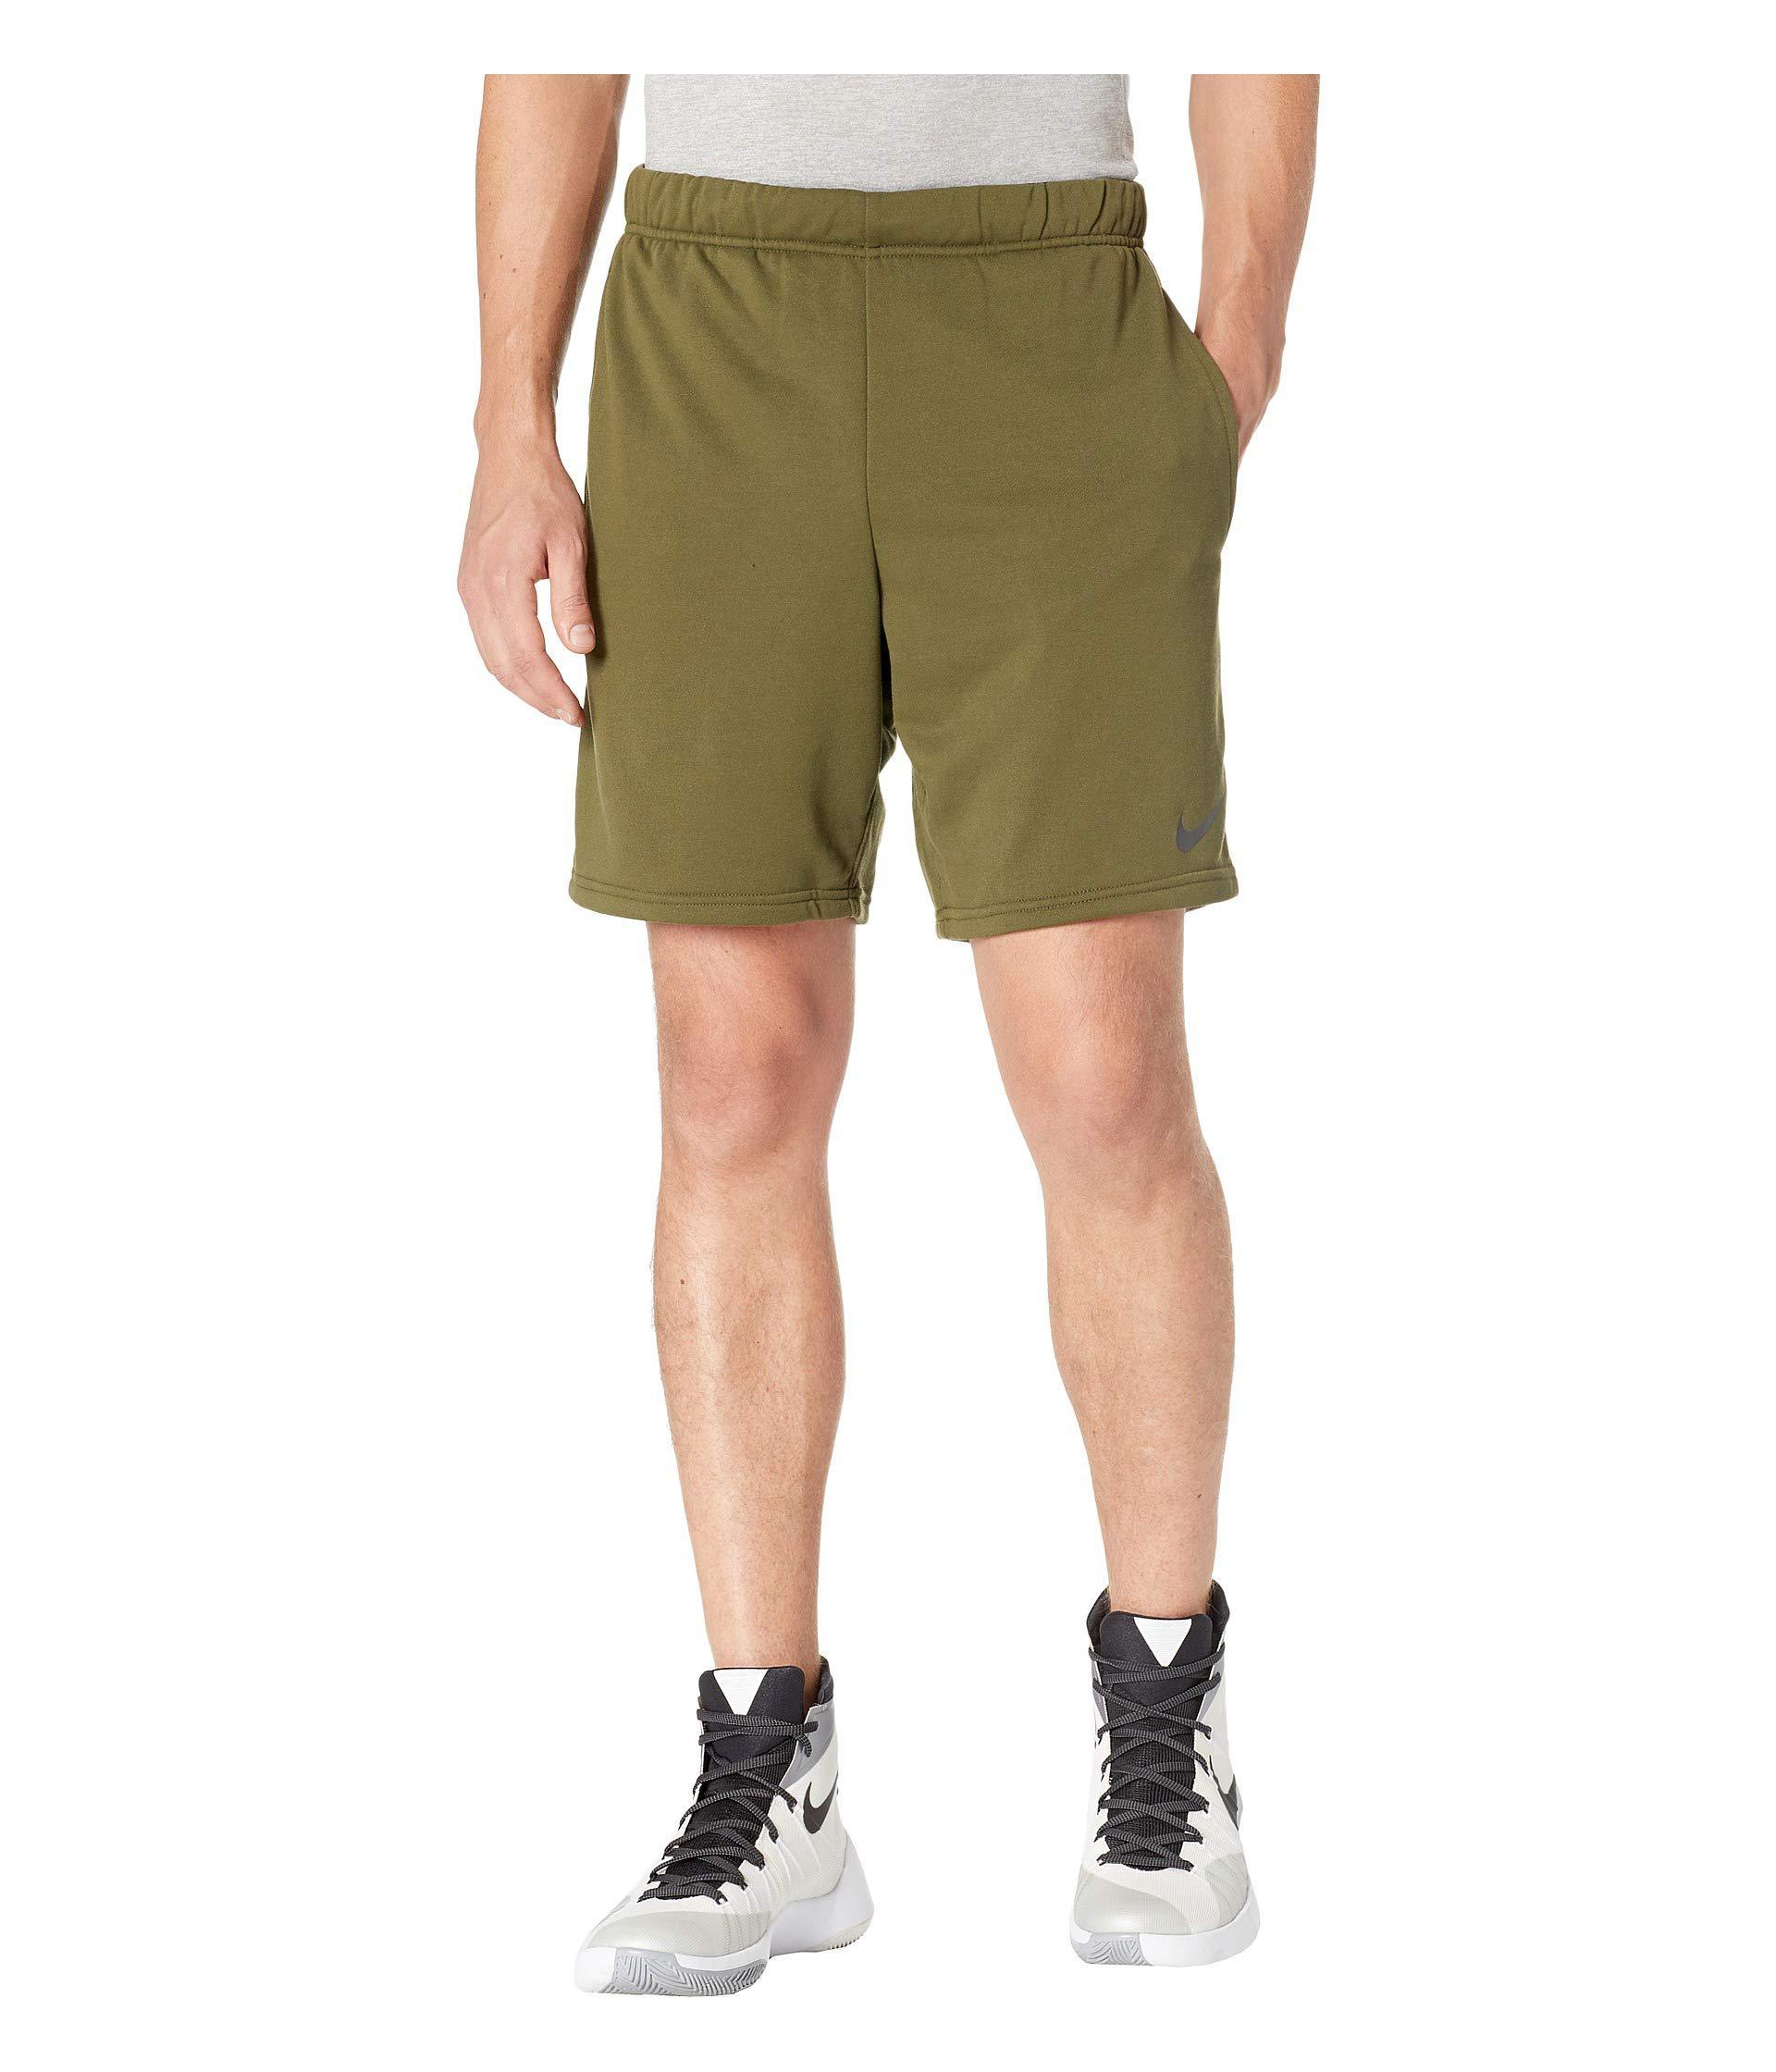 4f42efcd95 Lyst - Nike Dry Fleece Hybrid Shorts in Green for Men - Save 20%